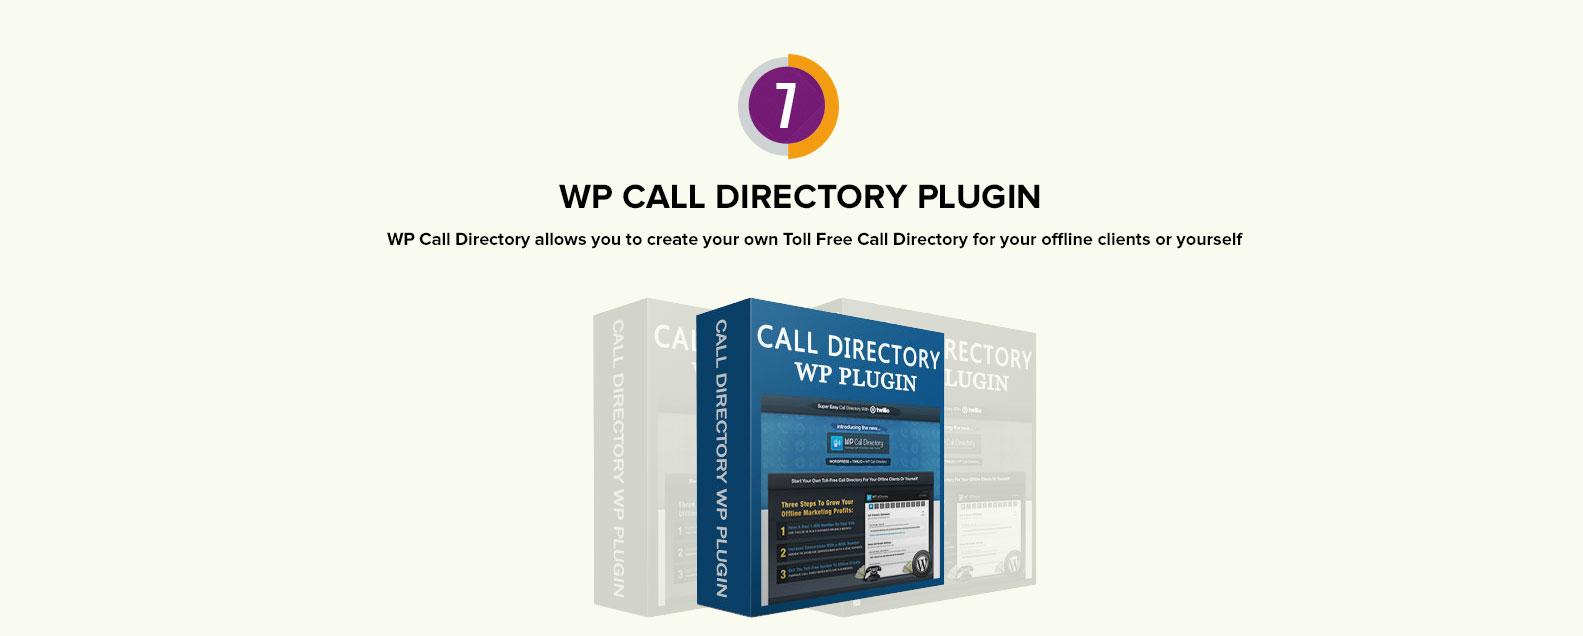 wp call directory plugin